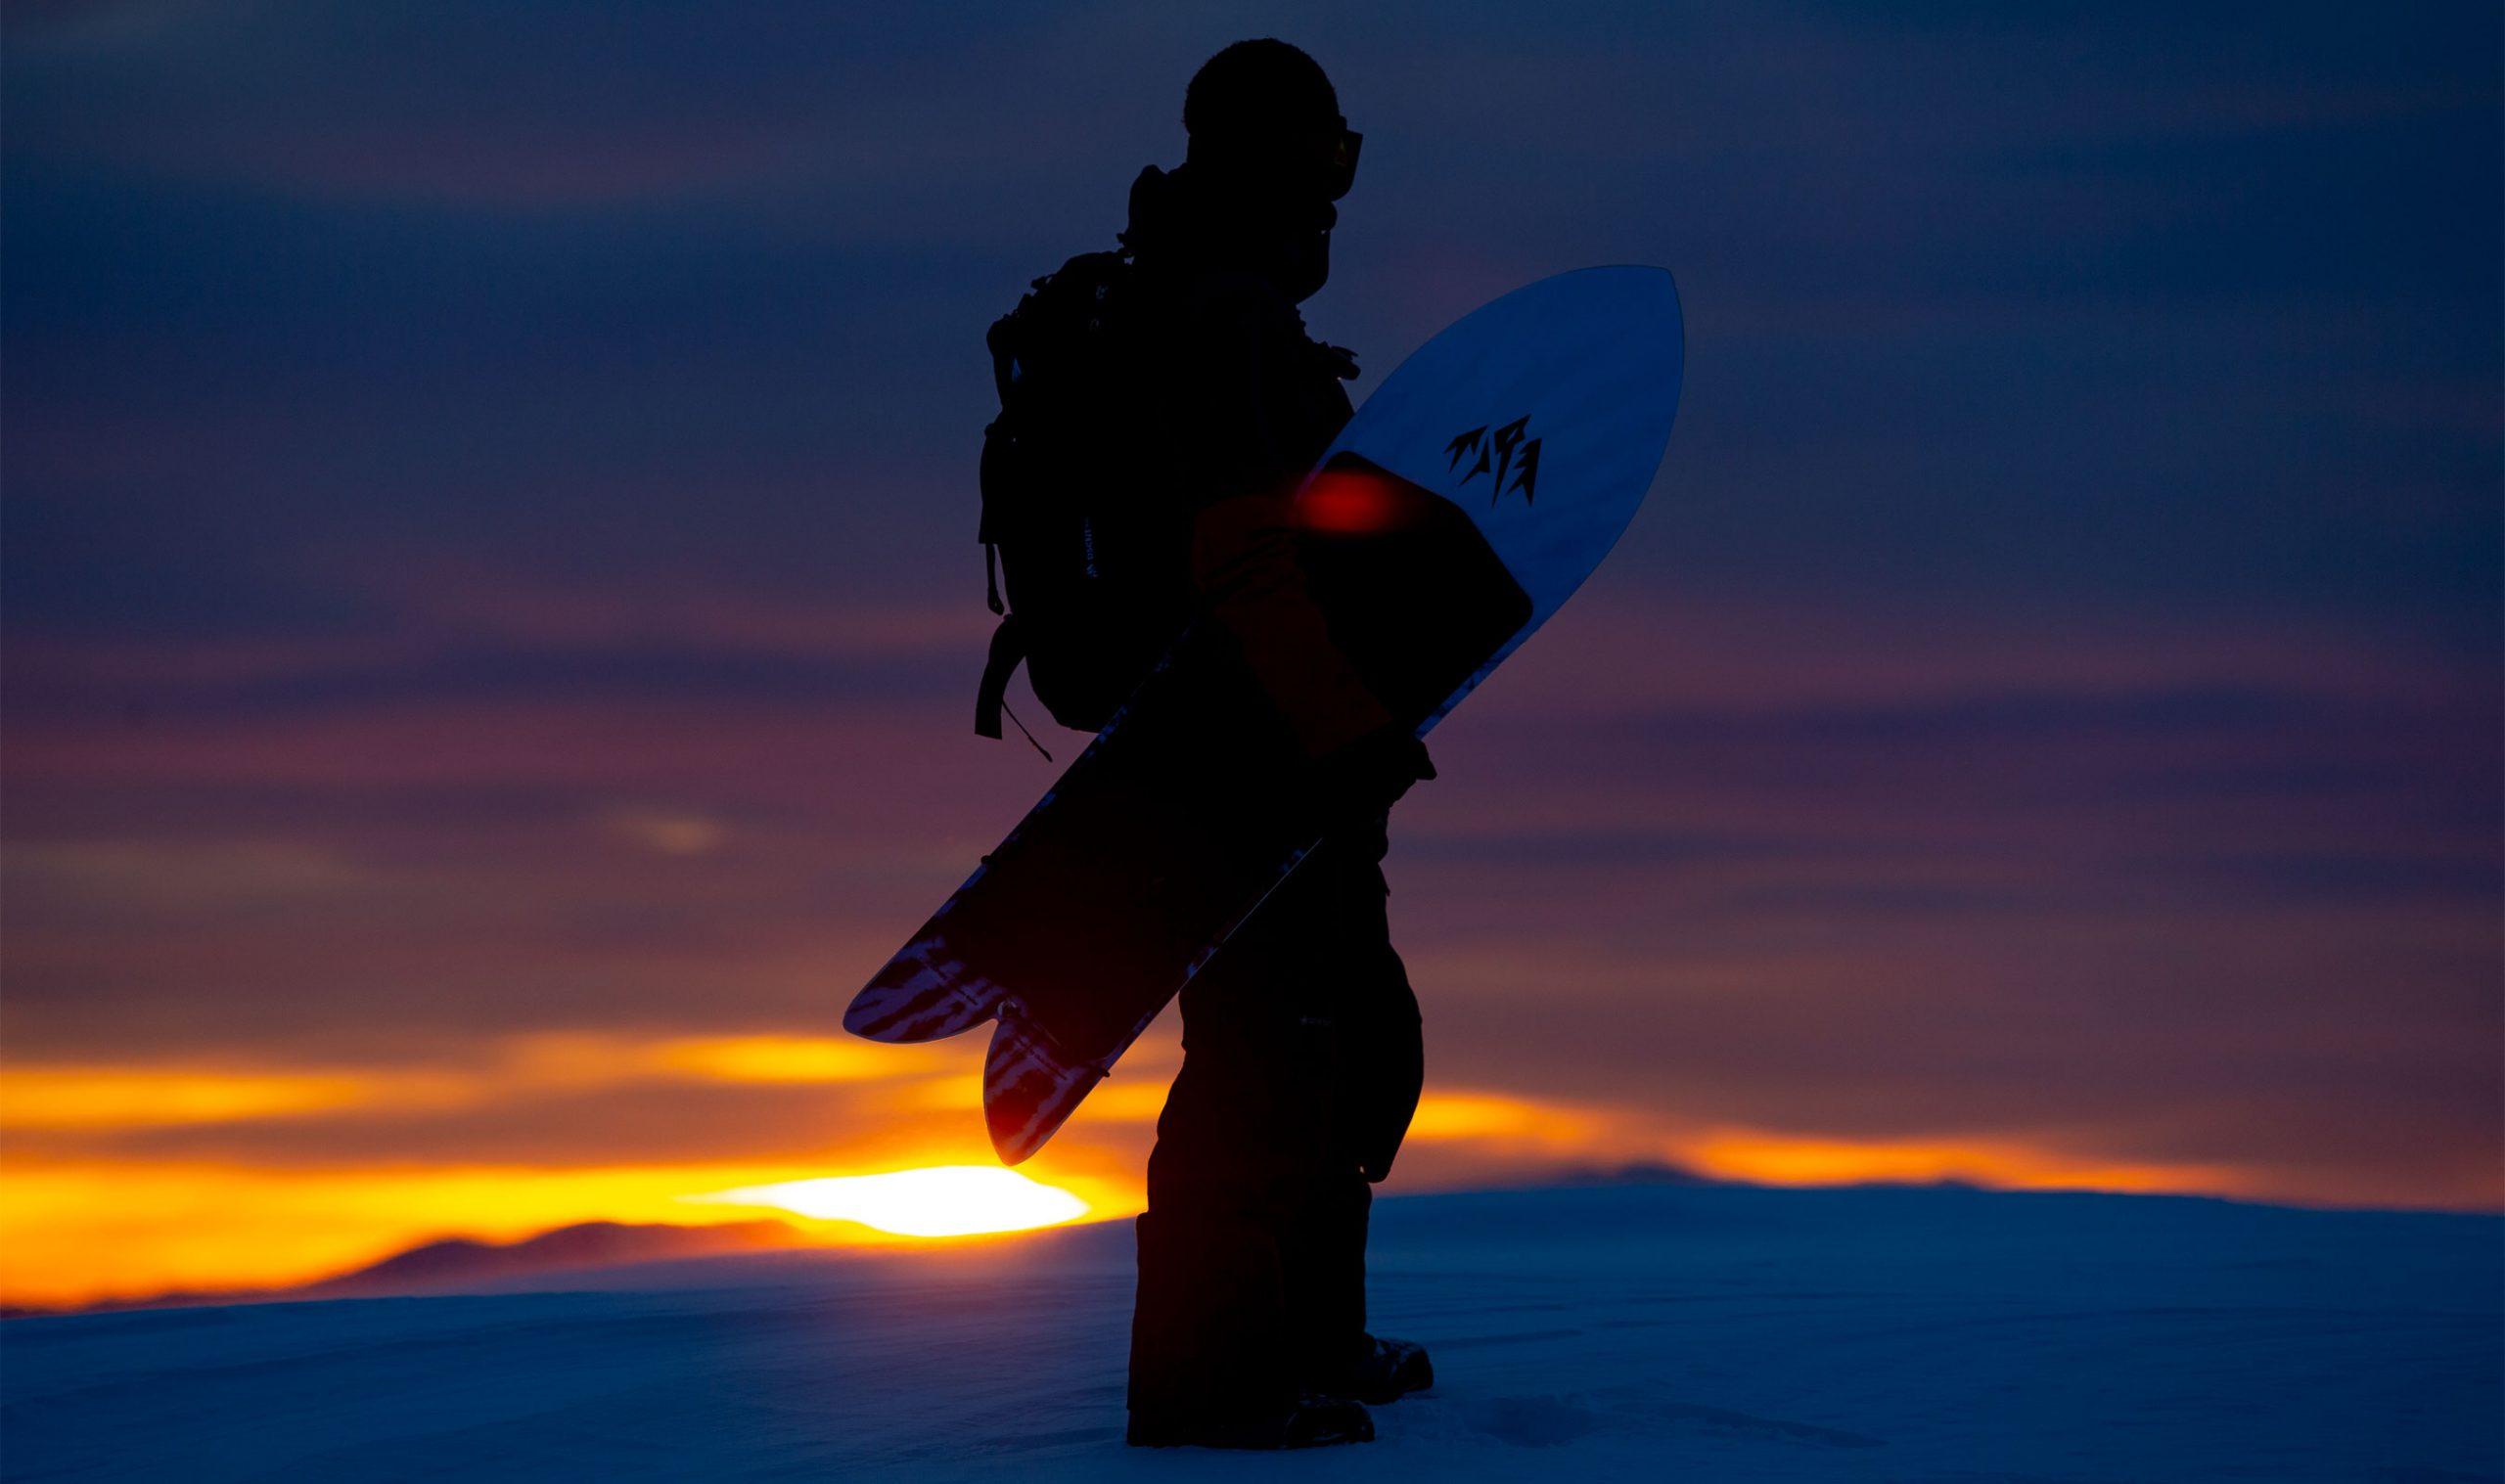 Mountain Surfer 2022